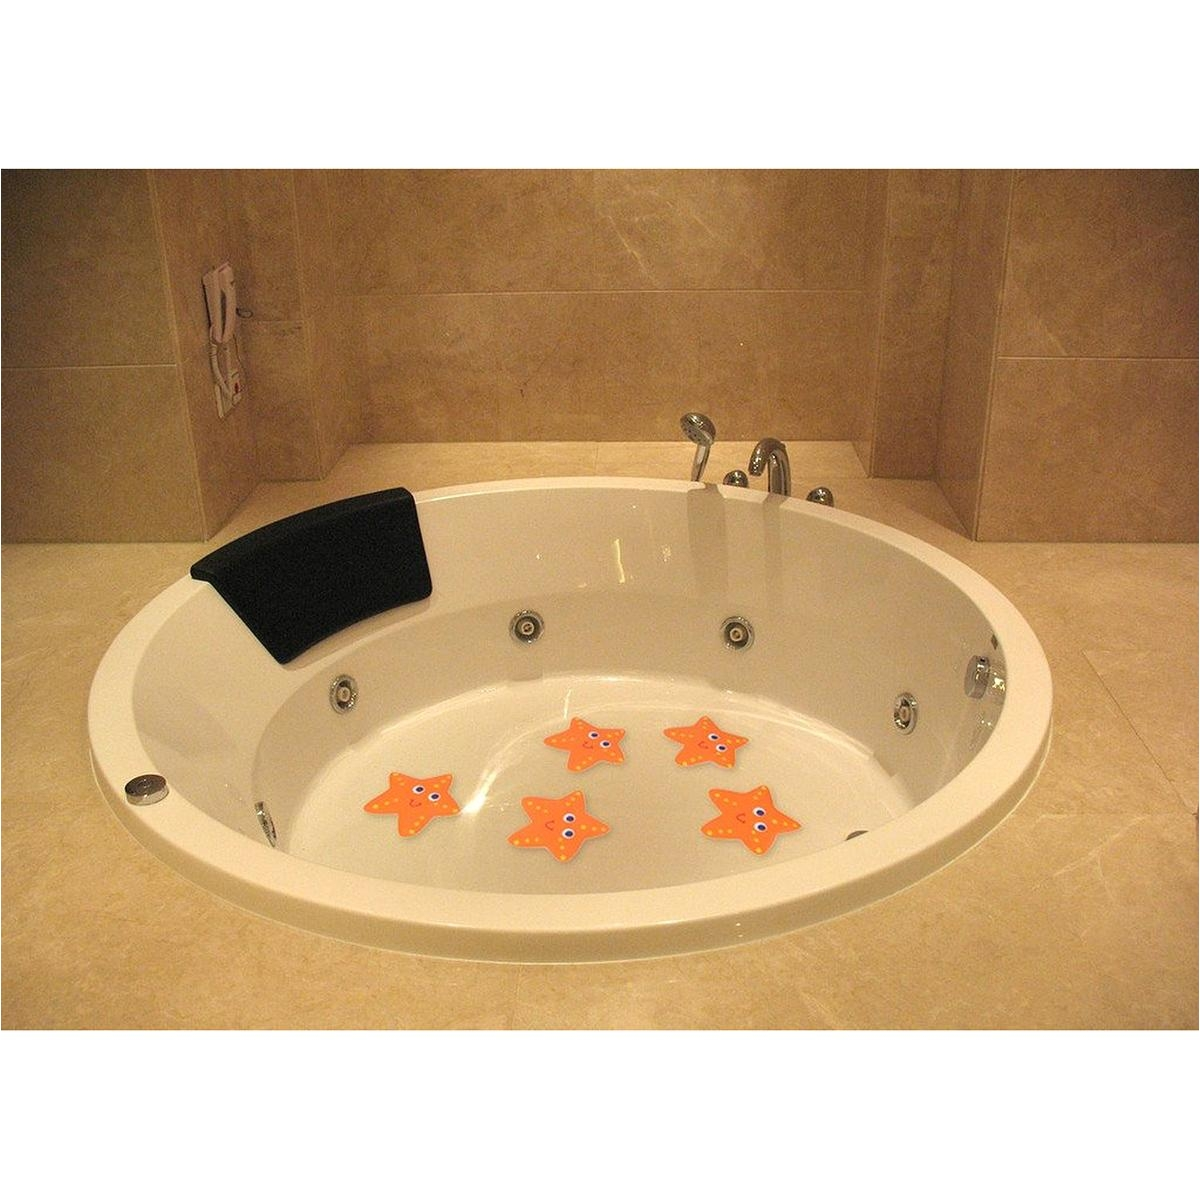 Bathtub Slip Stickers 5x Bath Tub Non Slip Safety Treads Sticker Bathroom Applique Decal